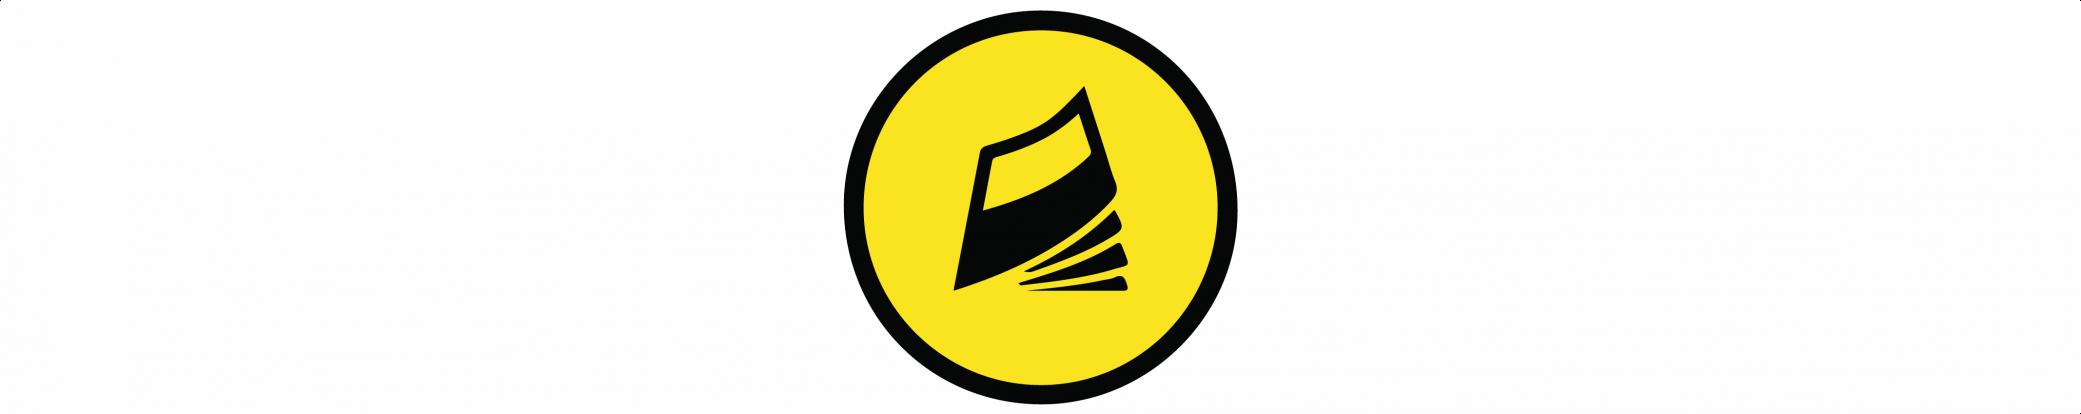 https://weekendrockstars.nl/wp-content/uploads/2021/03/icon-drukwerk-1024x204-2-2081x414.png